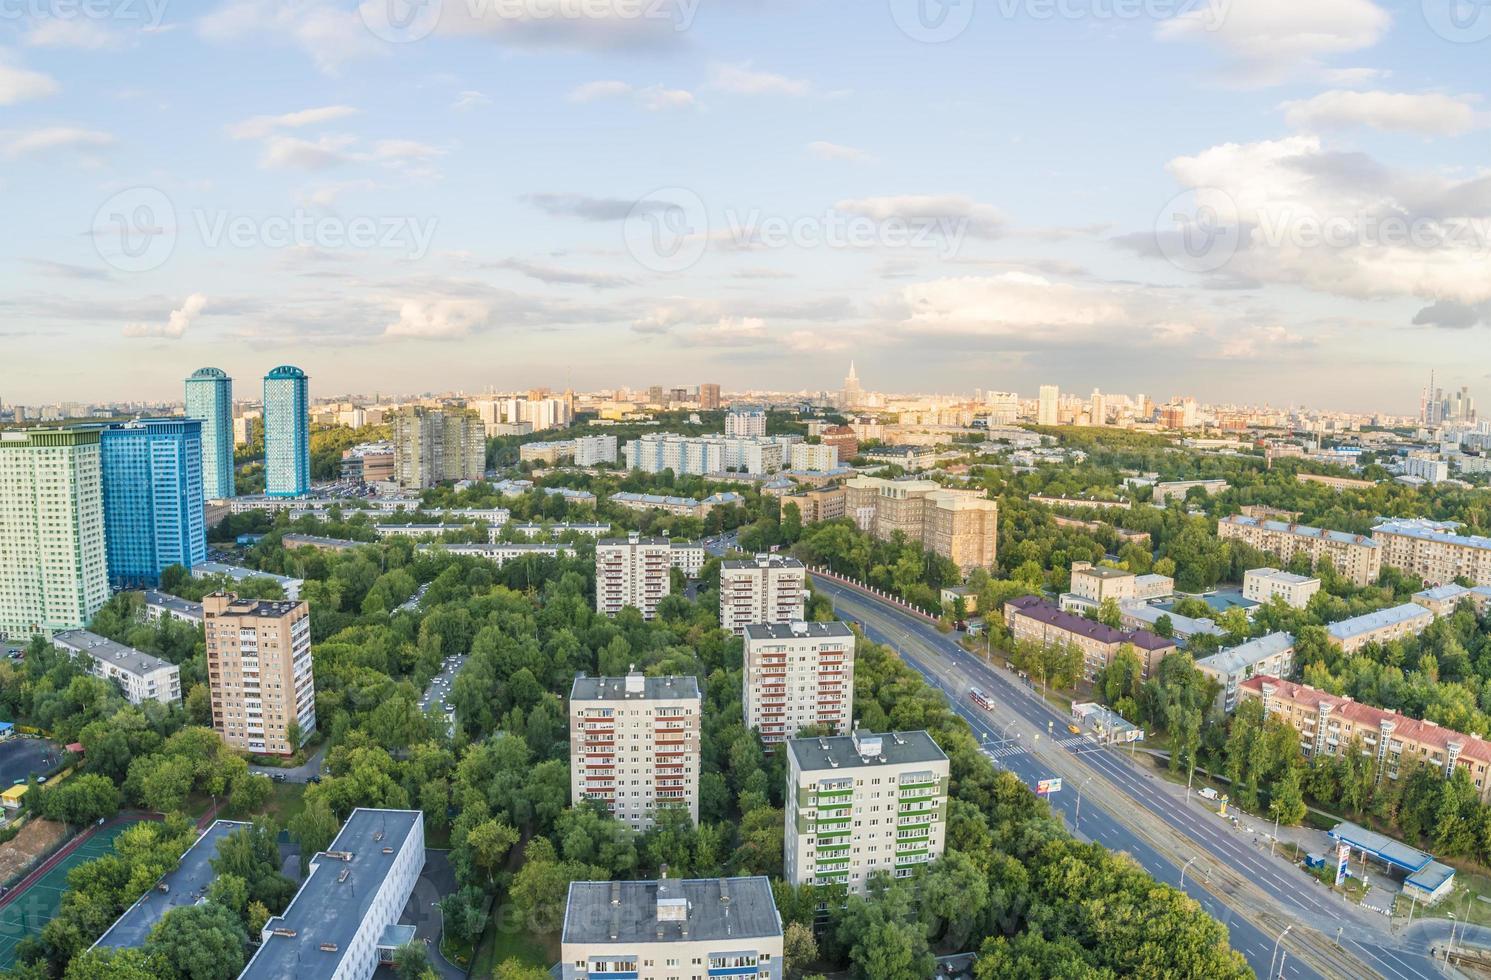 modernos distritos de edificios de gran altura residenciales de Moscú vista superior foto